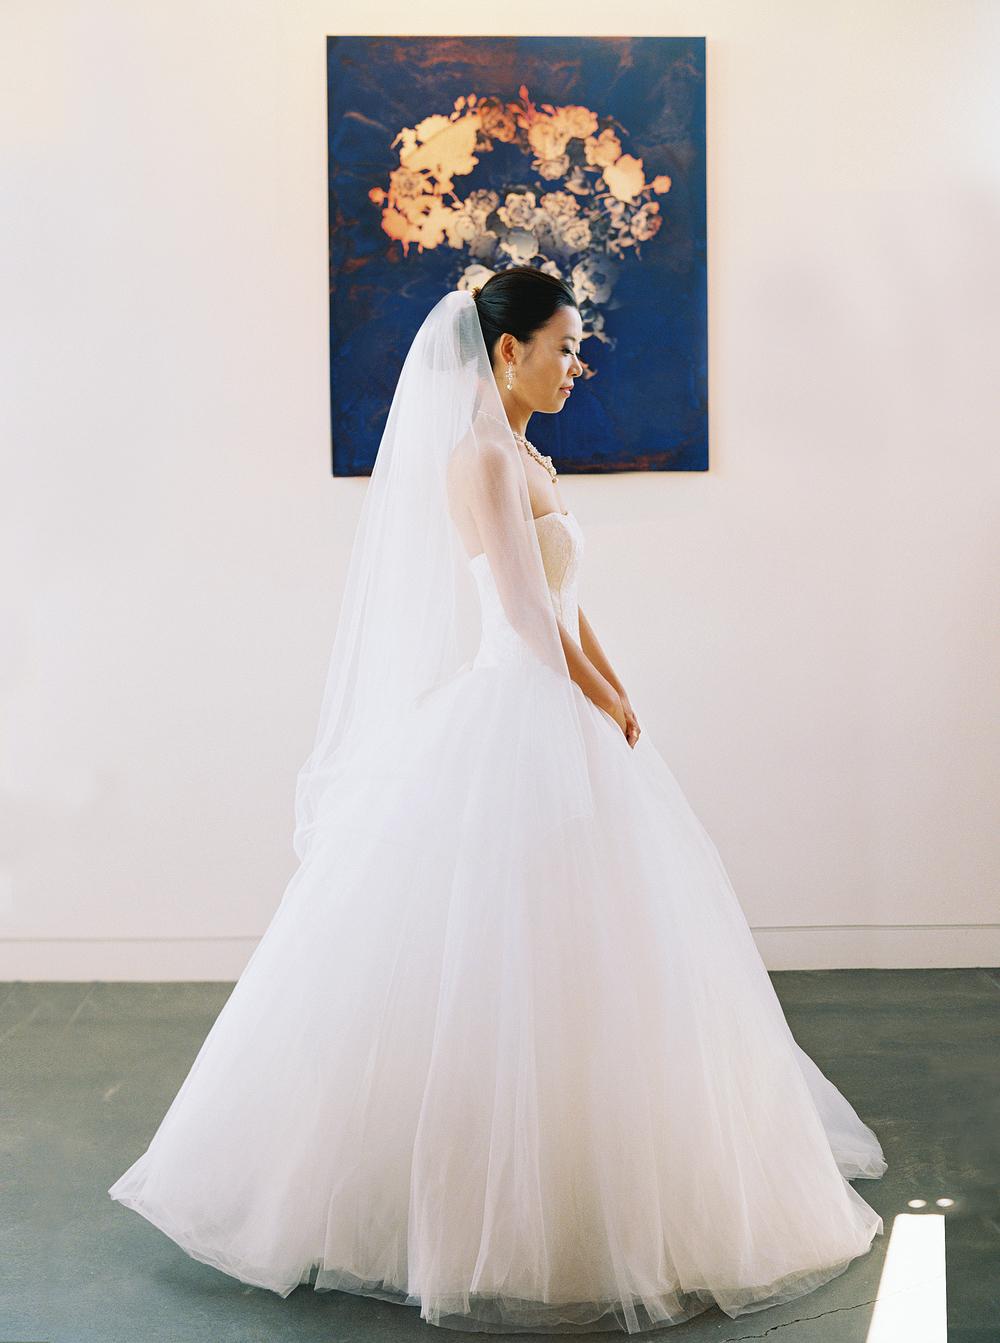 028+Saffron+Fields+Oregon+Fine+Art+Wedding+Photographer+Outlive+Creative.jpg